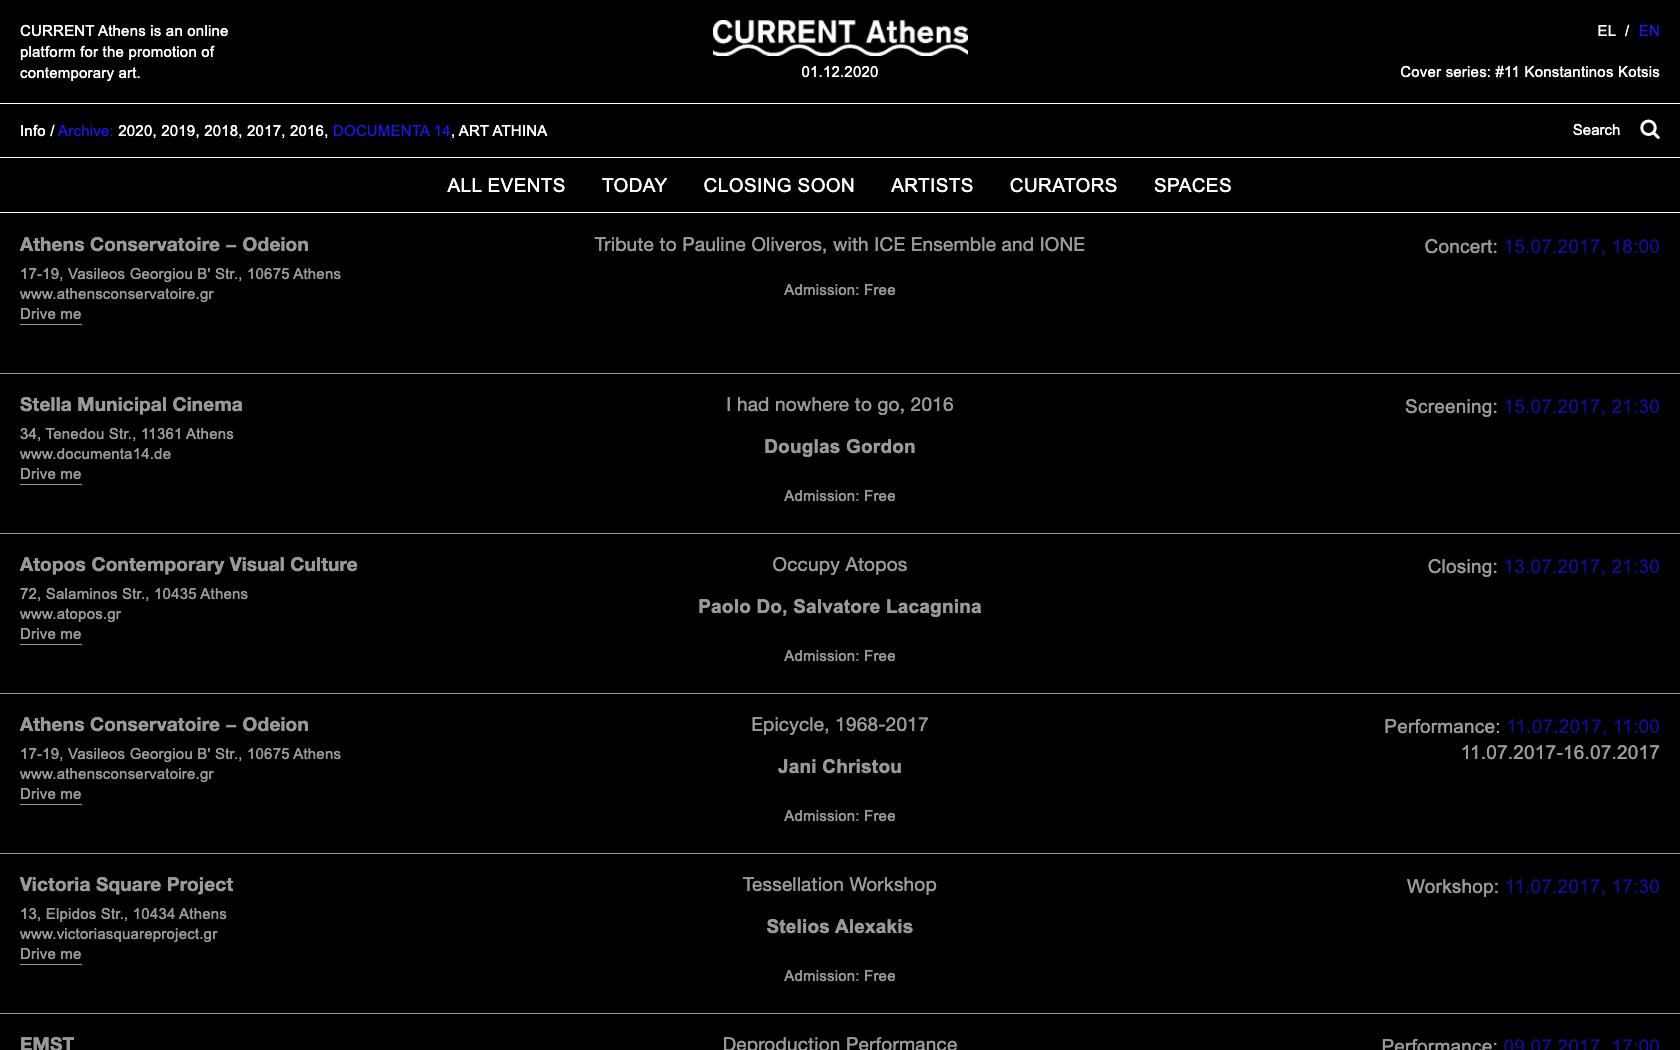 CURRENTAthens_Screenshot_03